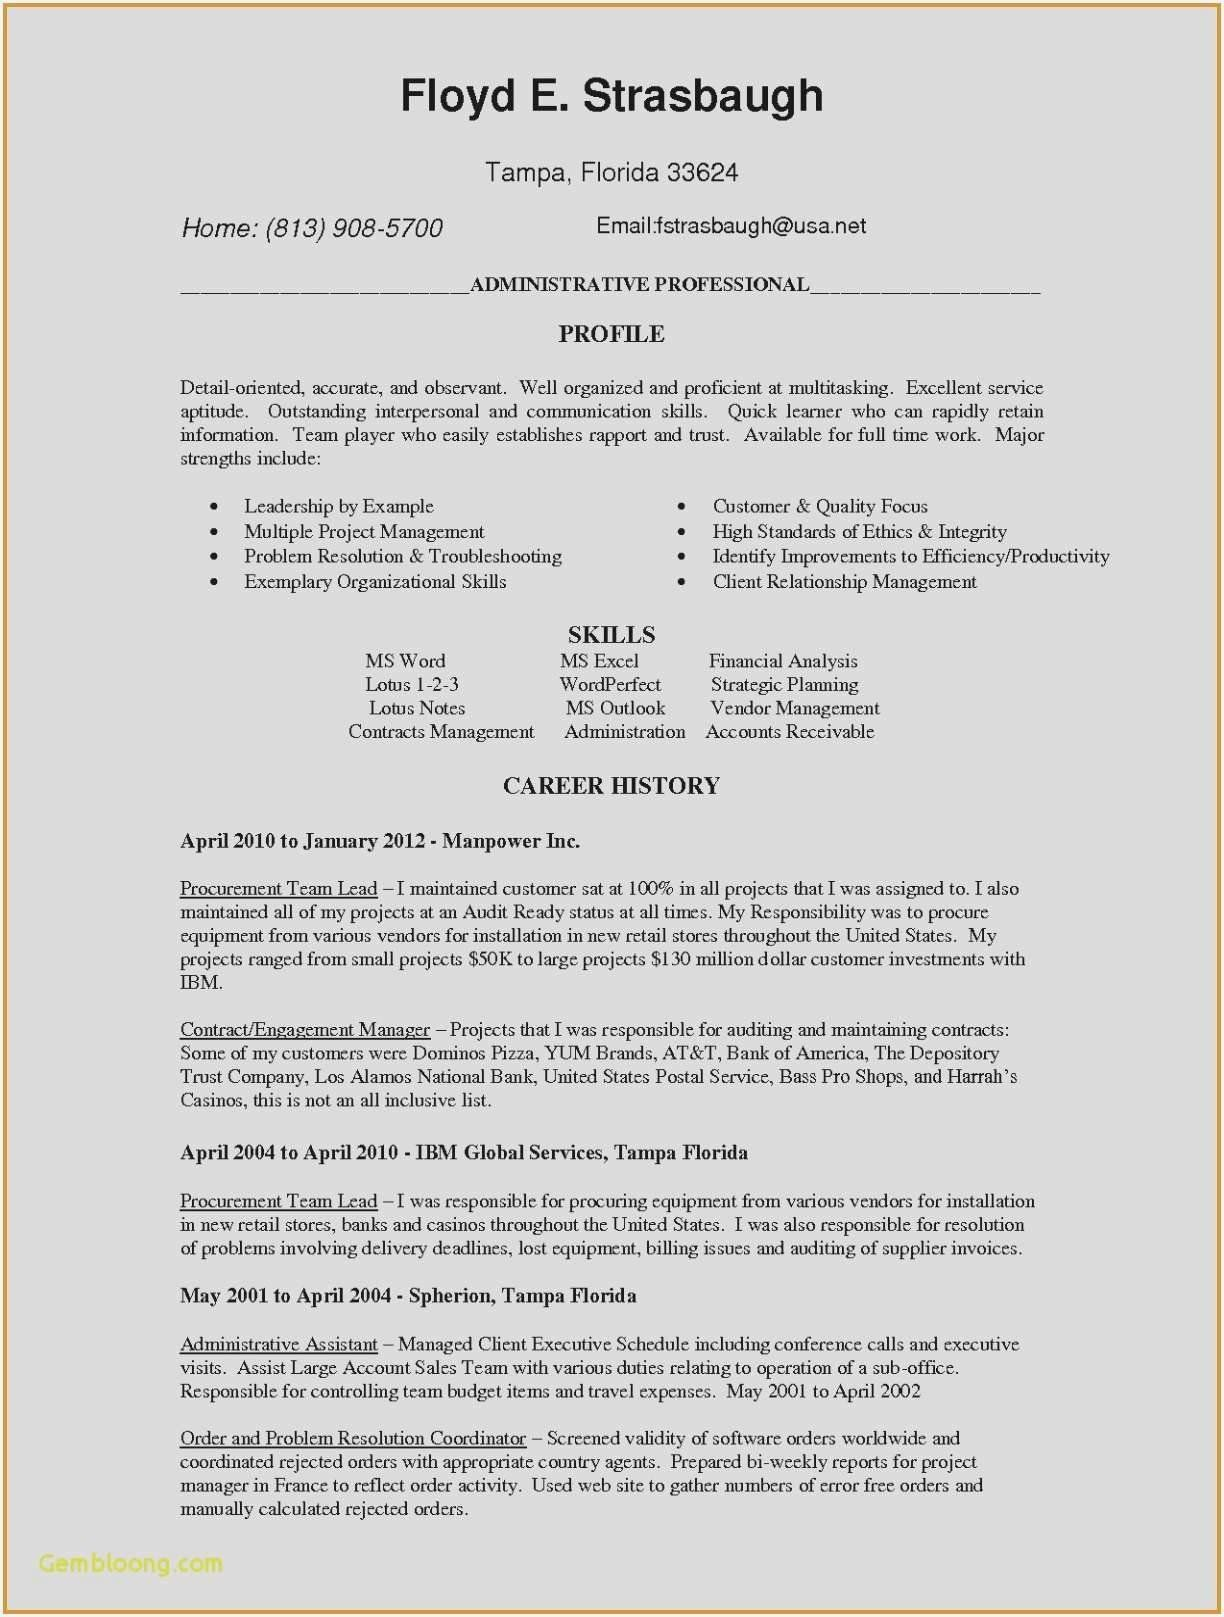 Account Receivable Resume Sample Lovely Banking Cover Letter New Vitae Curriculum Fresh Resume Cover Cover Letter For Resume Resume Skills Job Letter